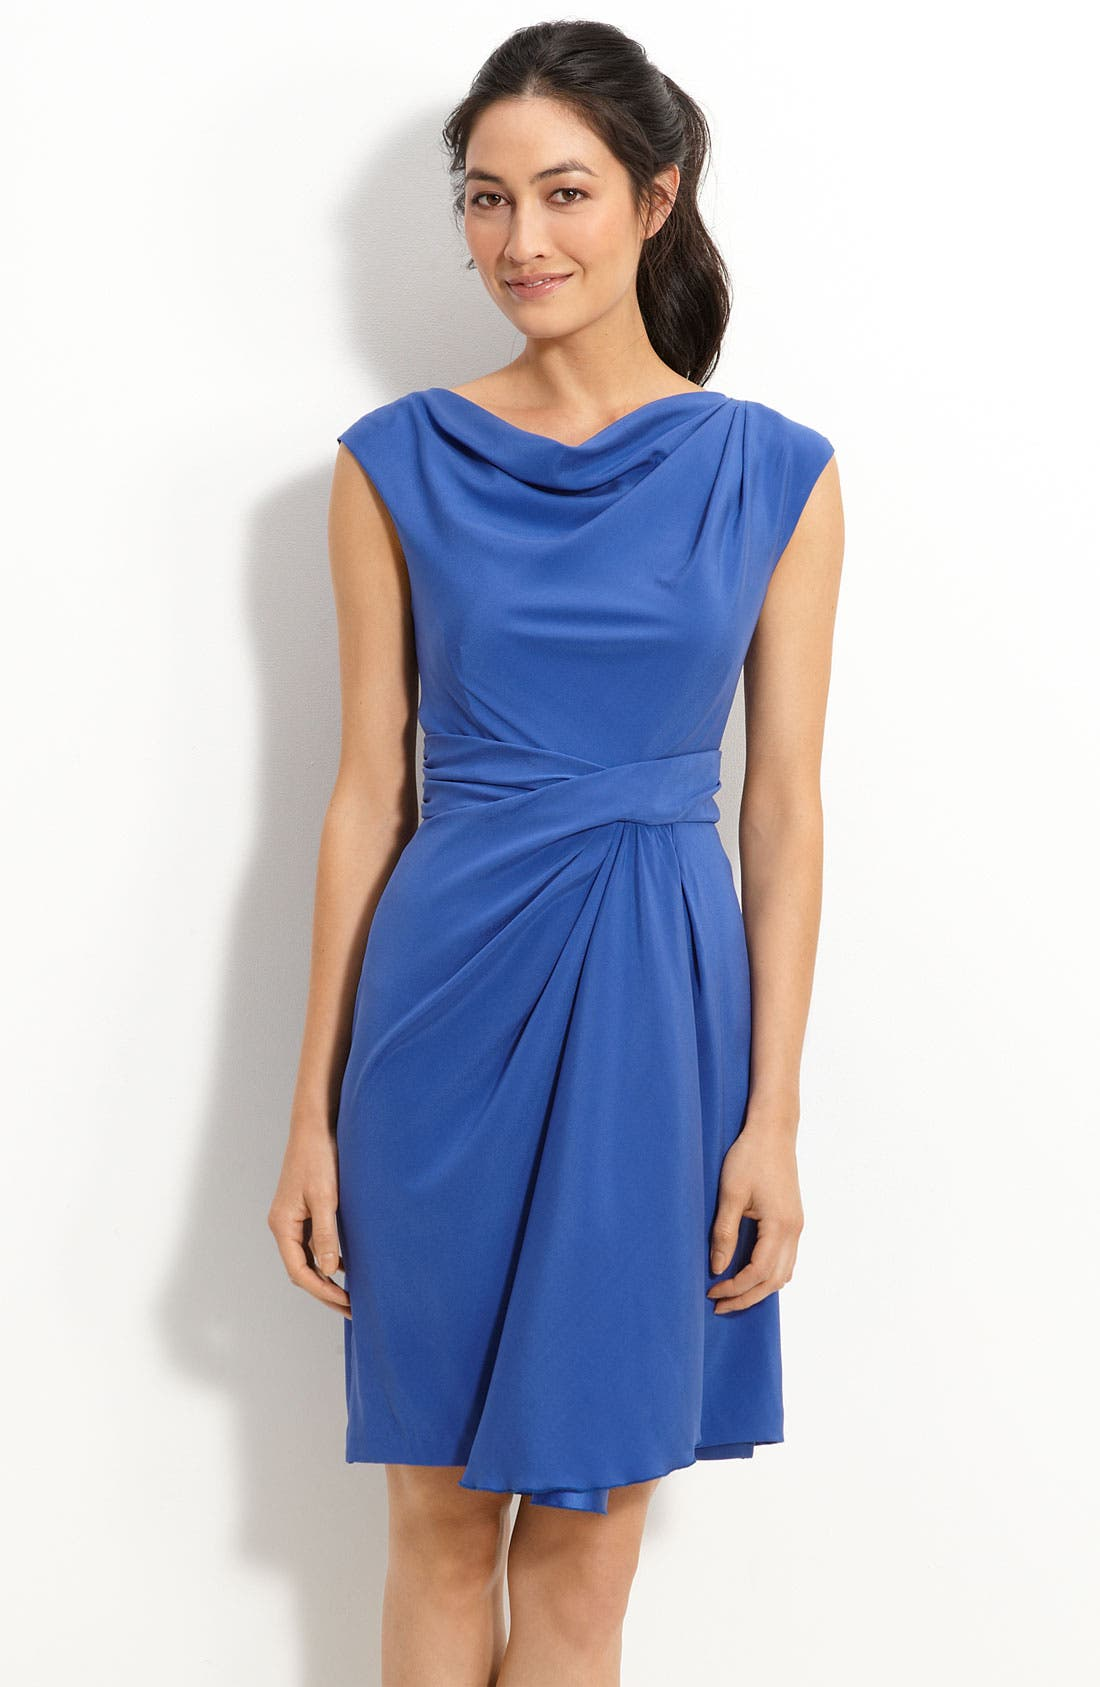 Main Image - Suzi Chin for Maggy Boutique Drape Front Silk Dress